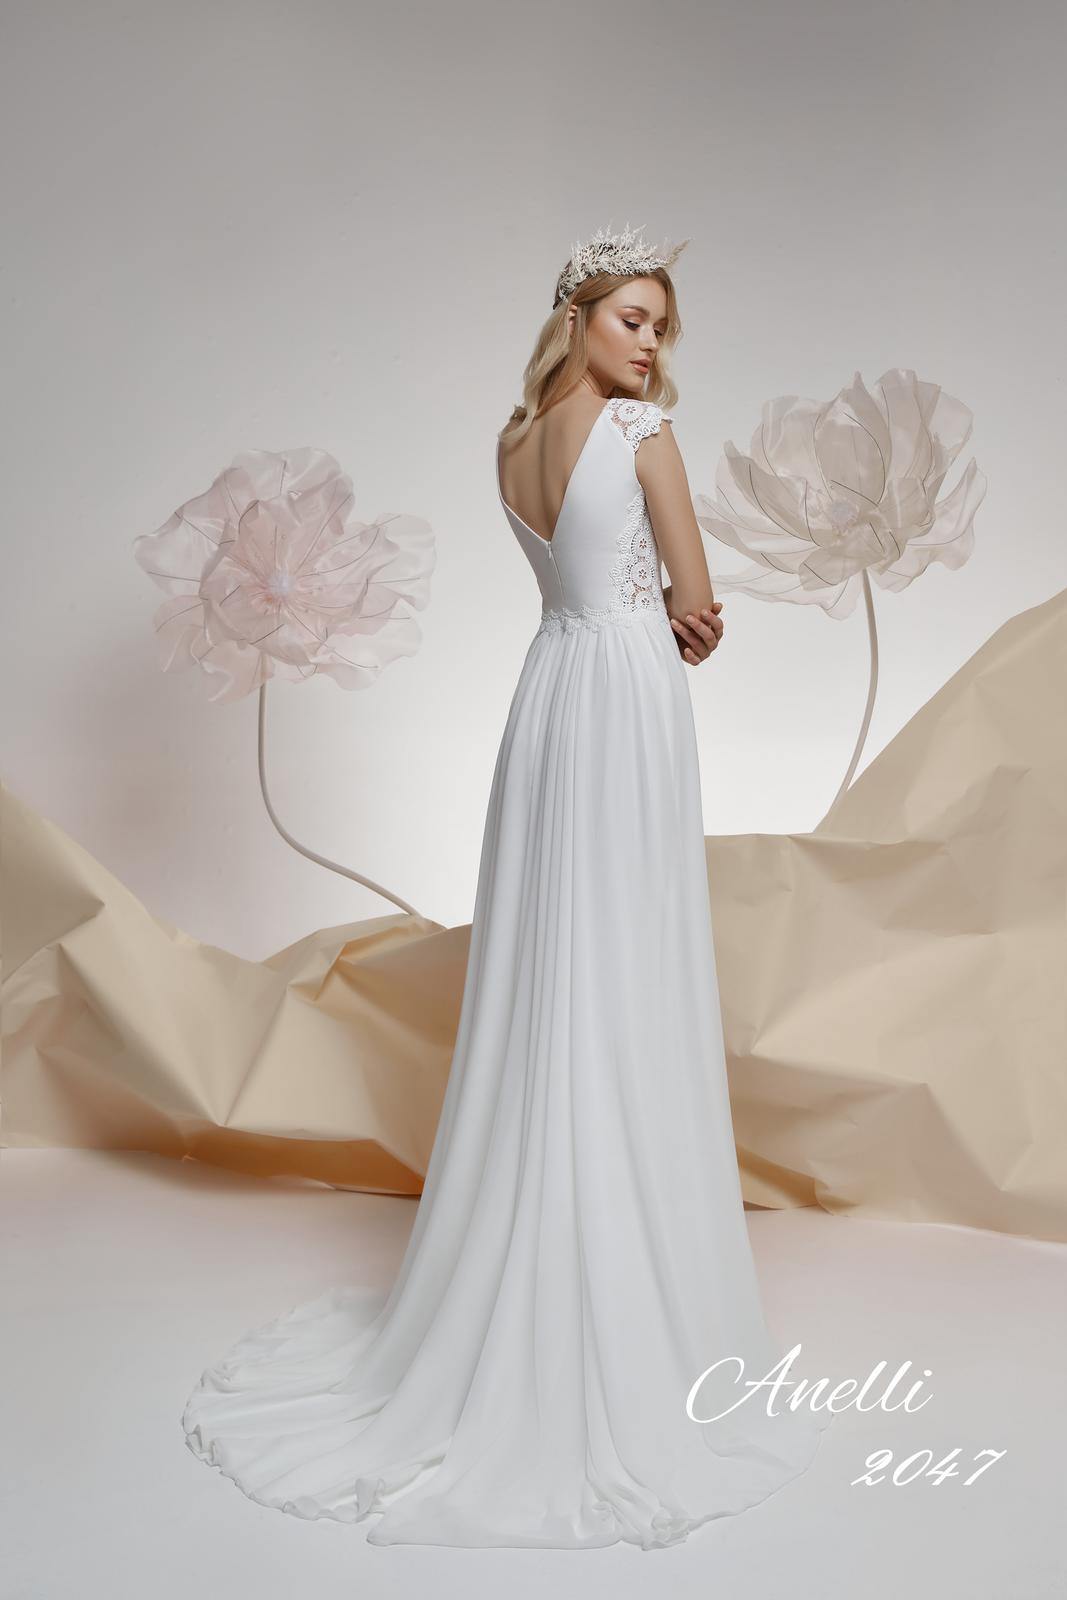 Svadobné šaty - Imagine 2047 - Obrázok č. 3